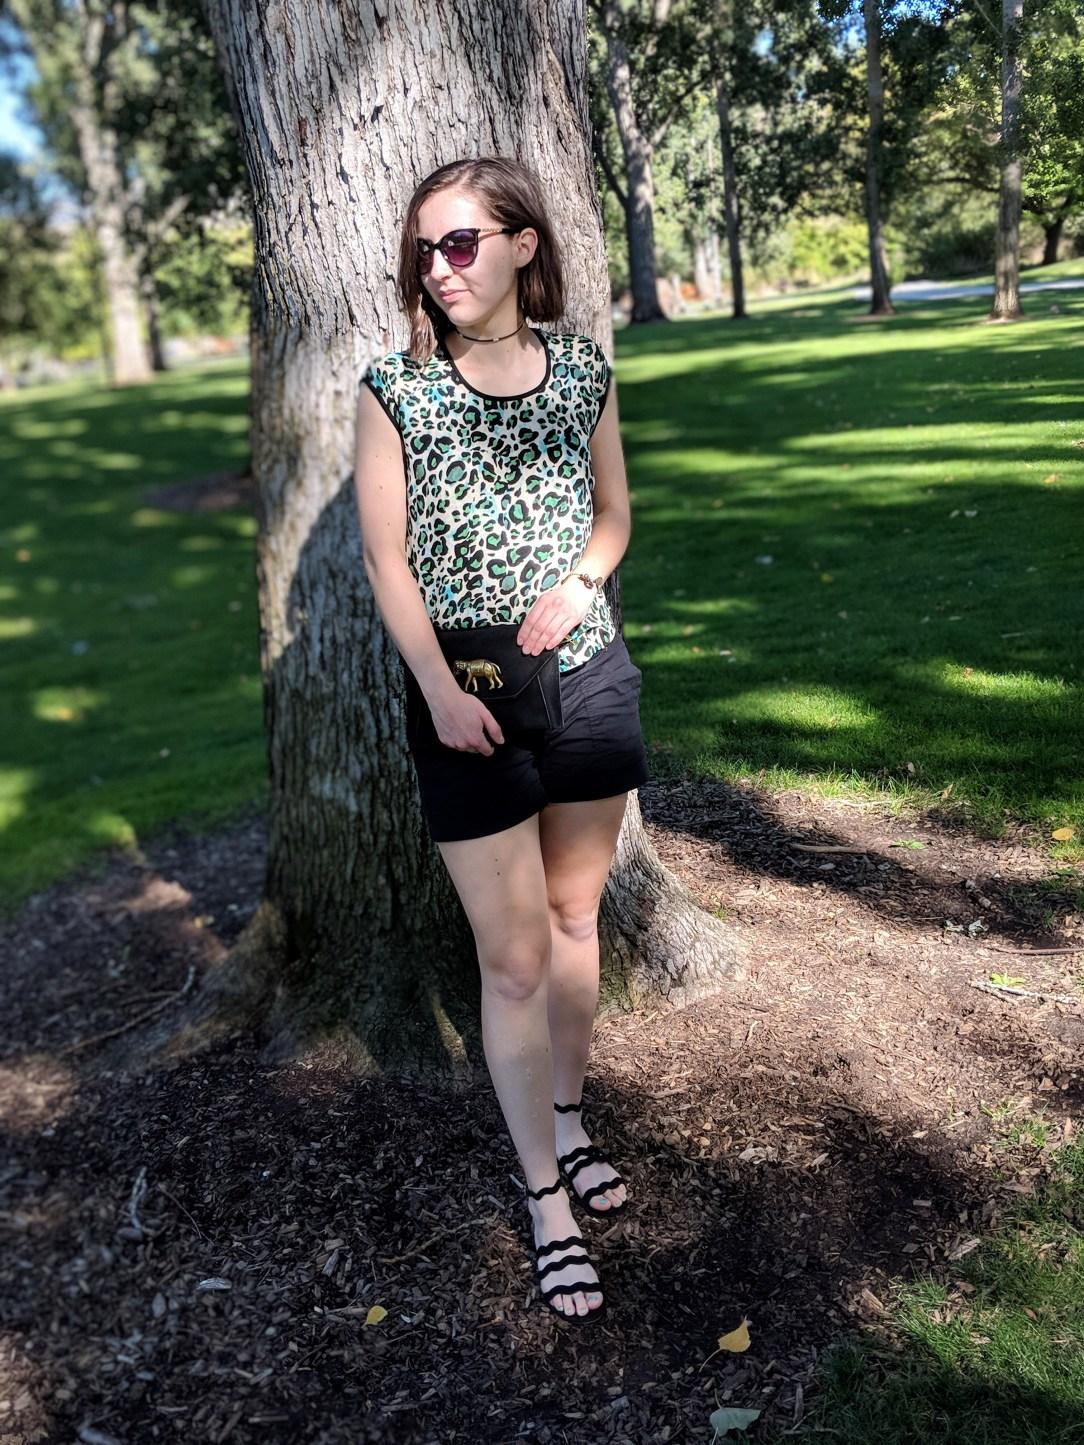 green leopard blouse, black shorts, black sandals